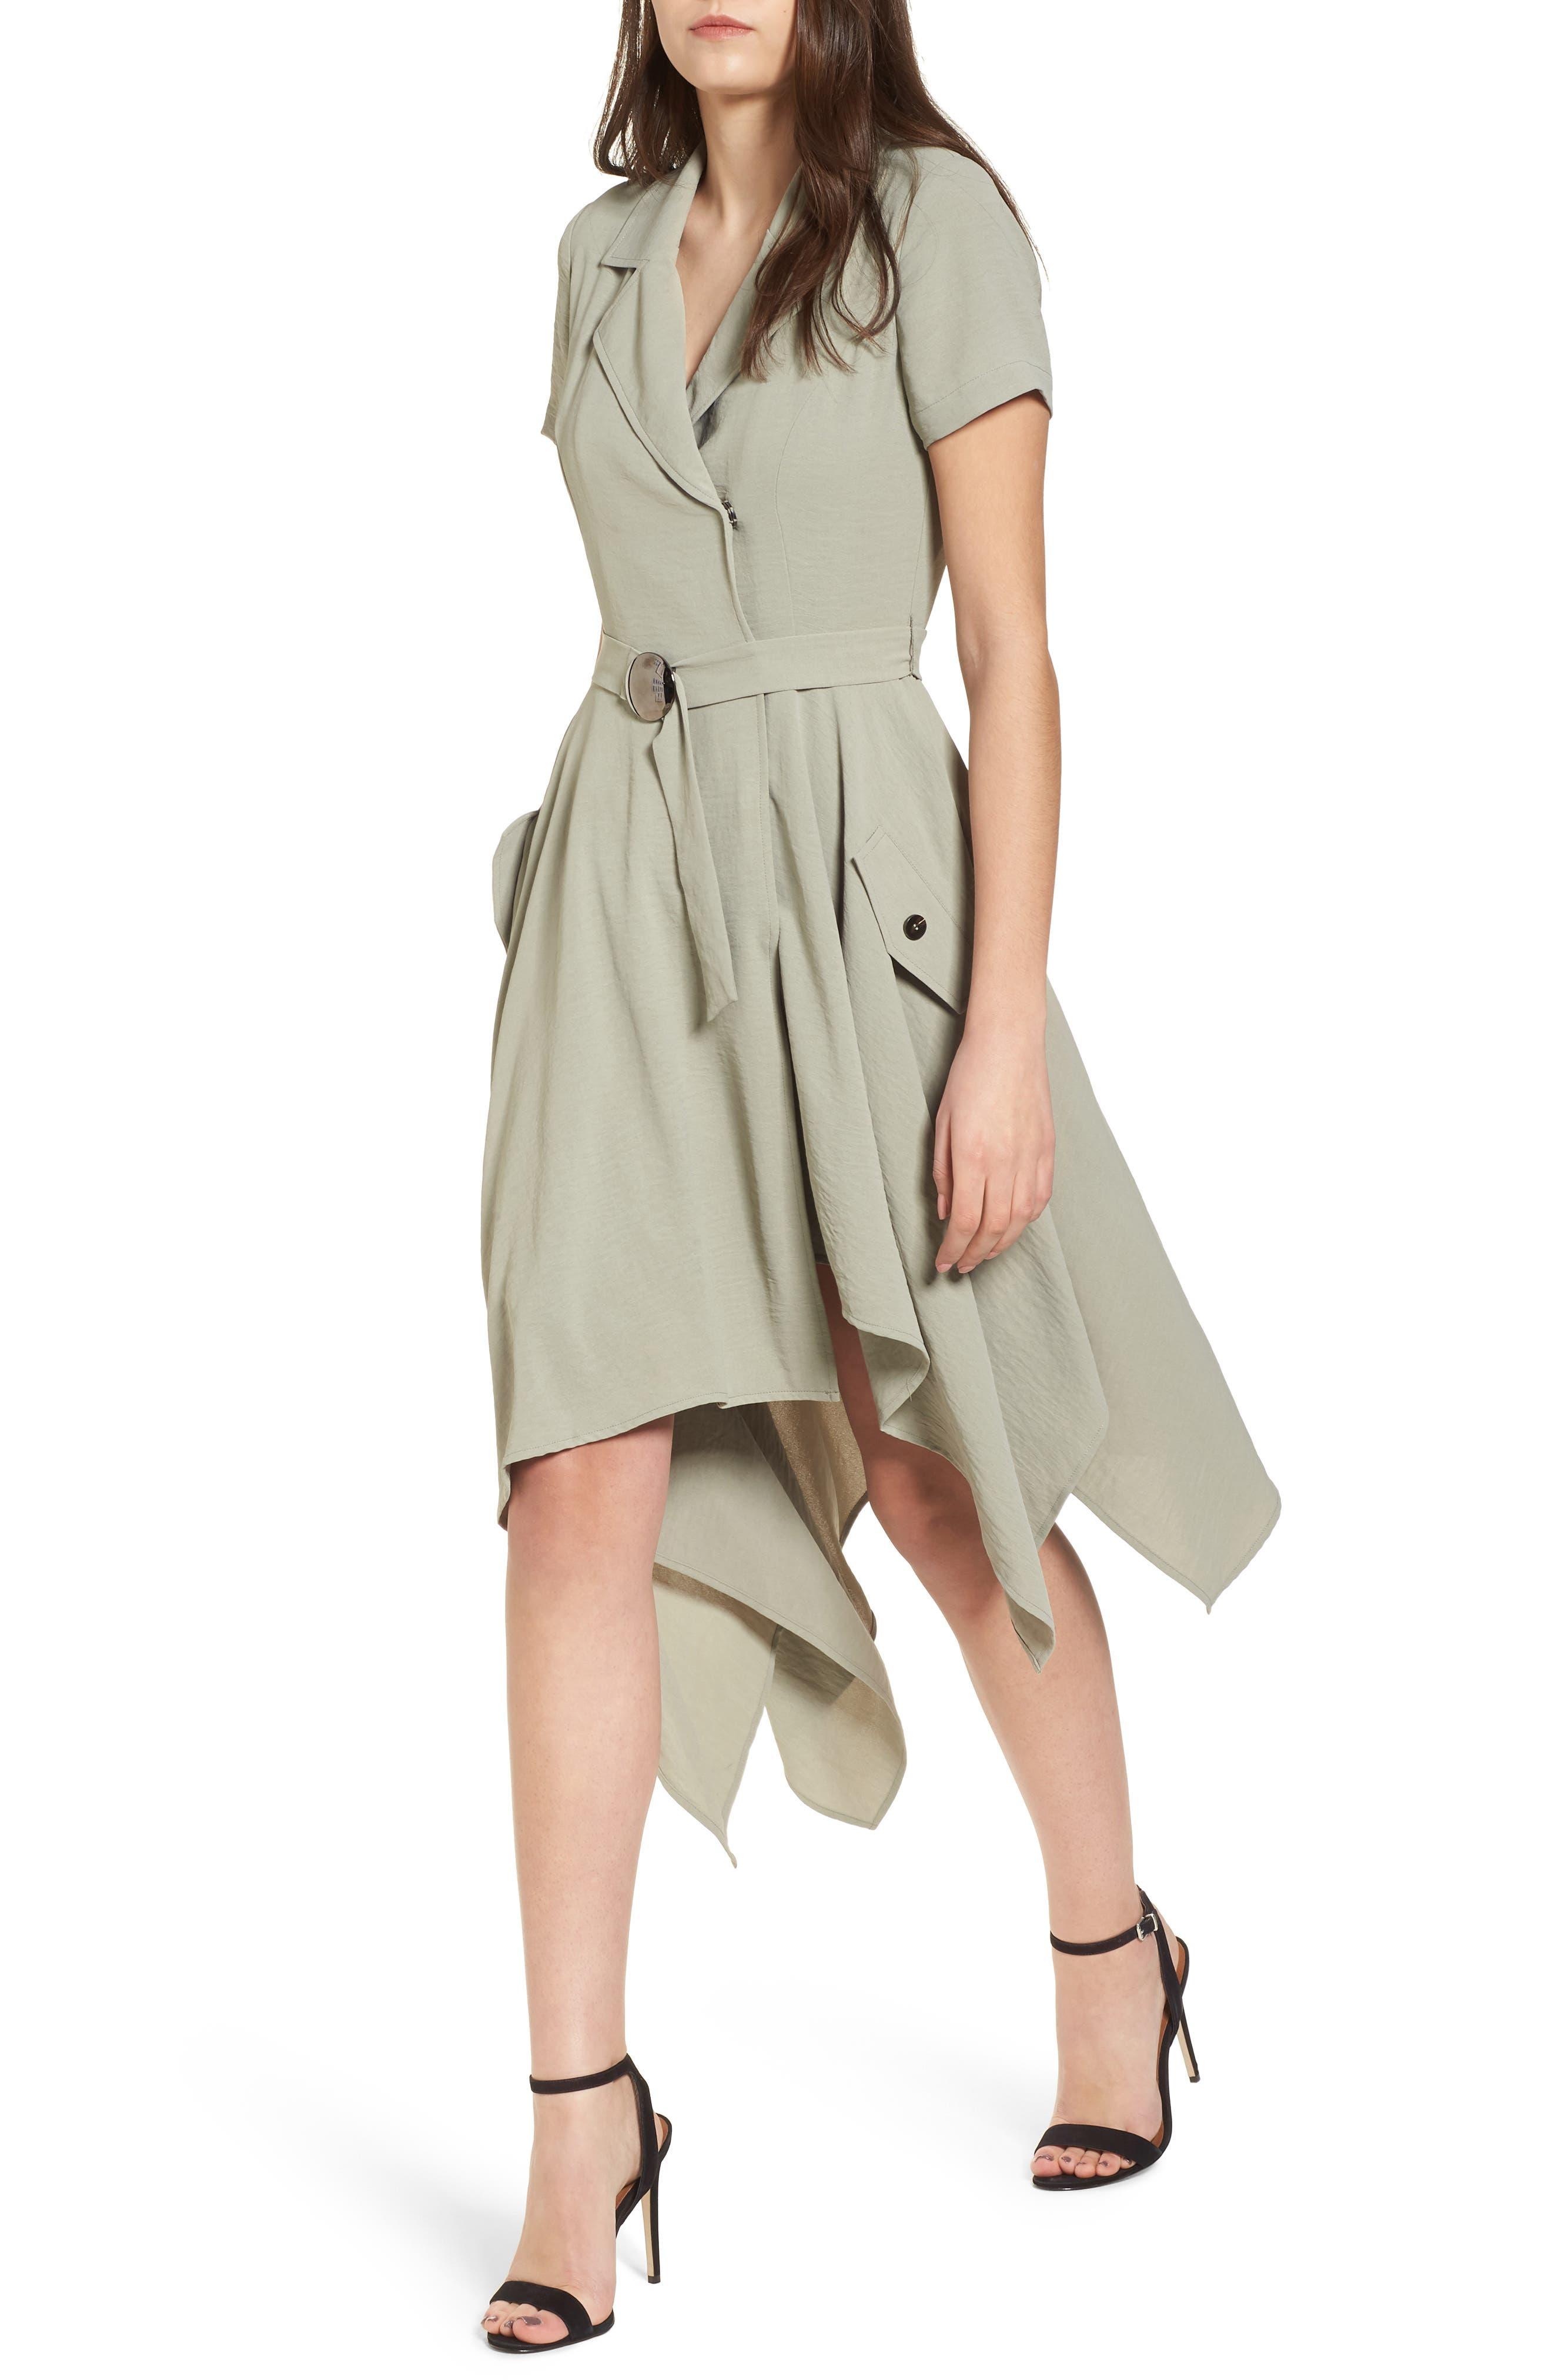 Chriselle x J.O.A. Asymmetrical Trench Dress,                         Main,                         color, 300